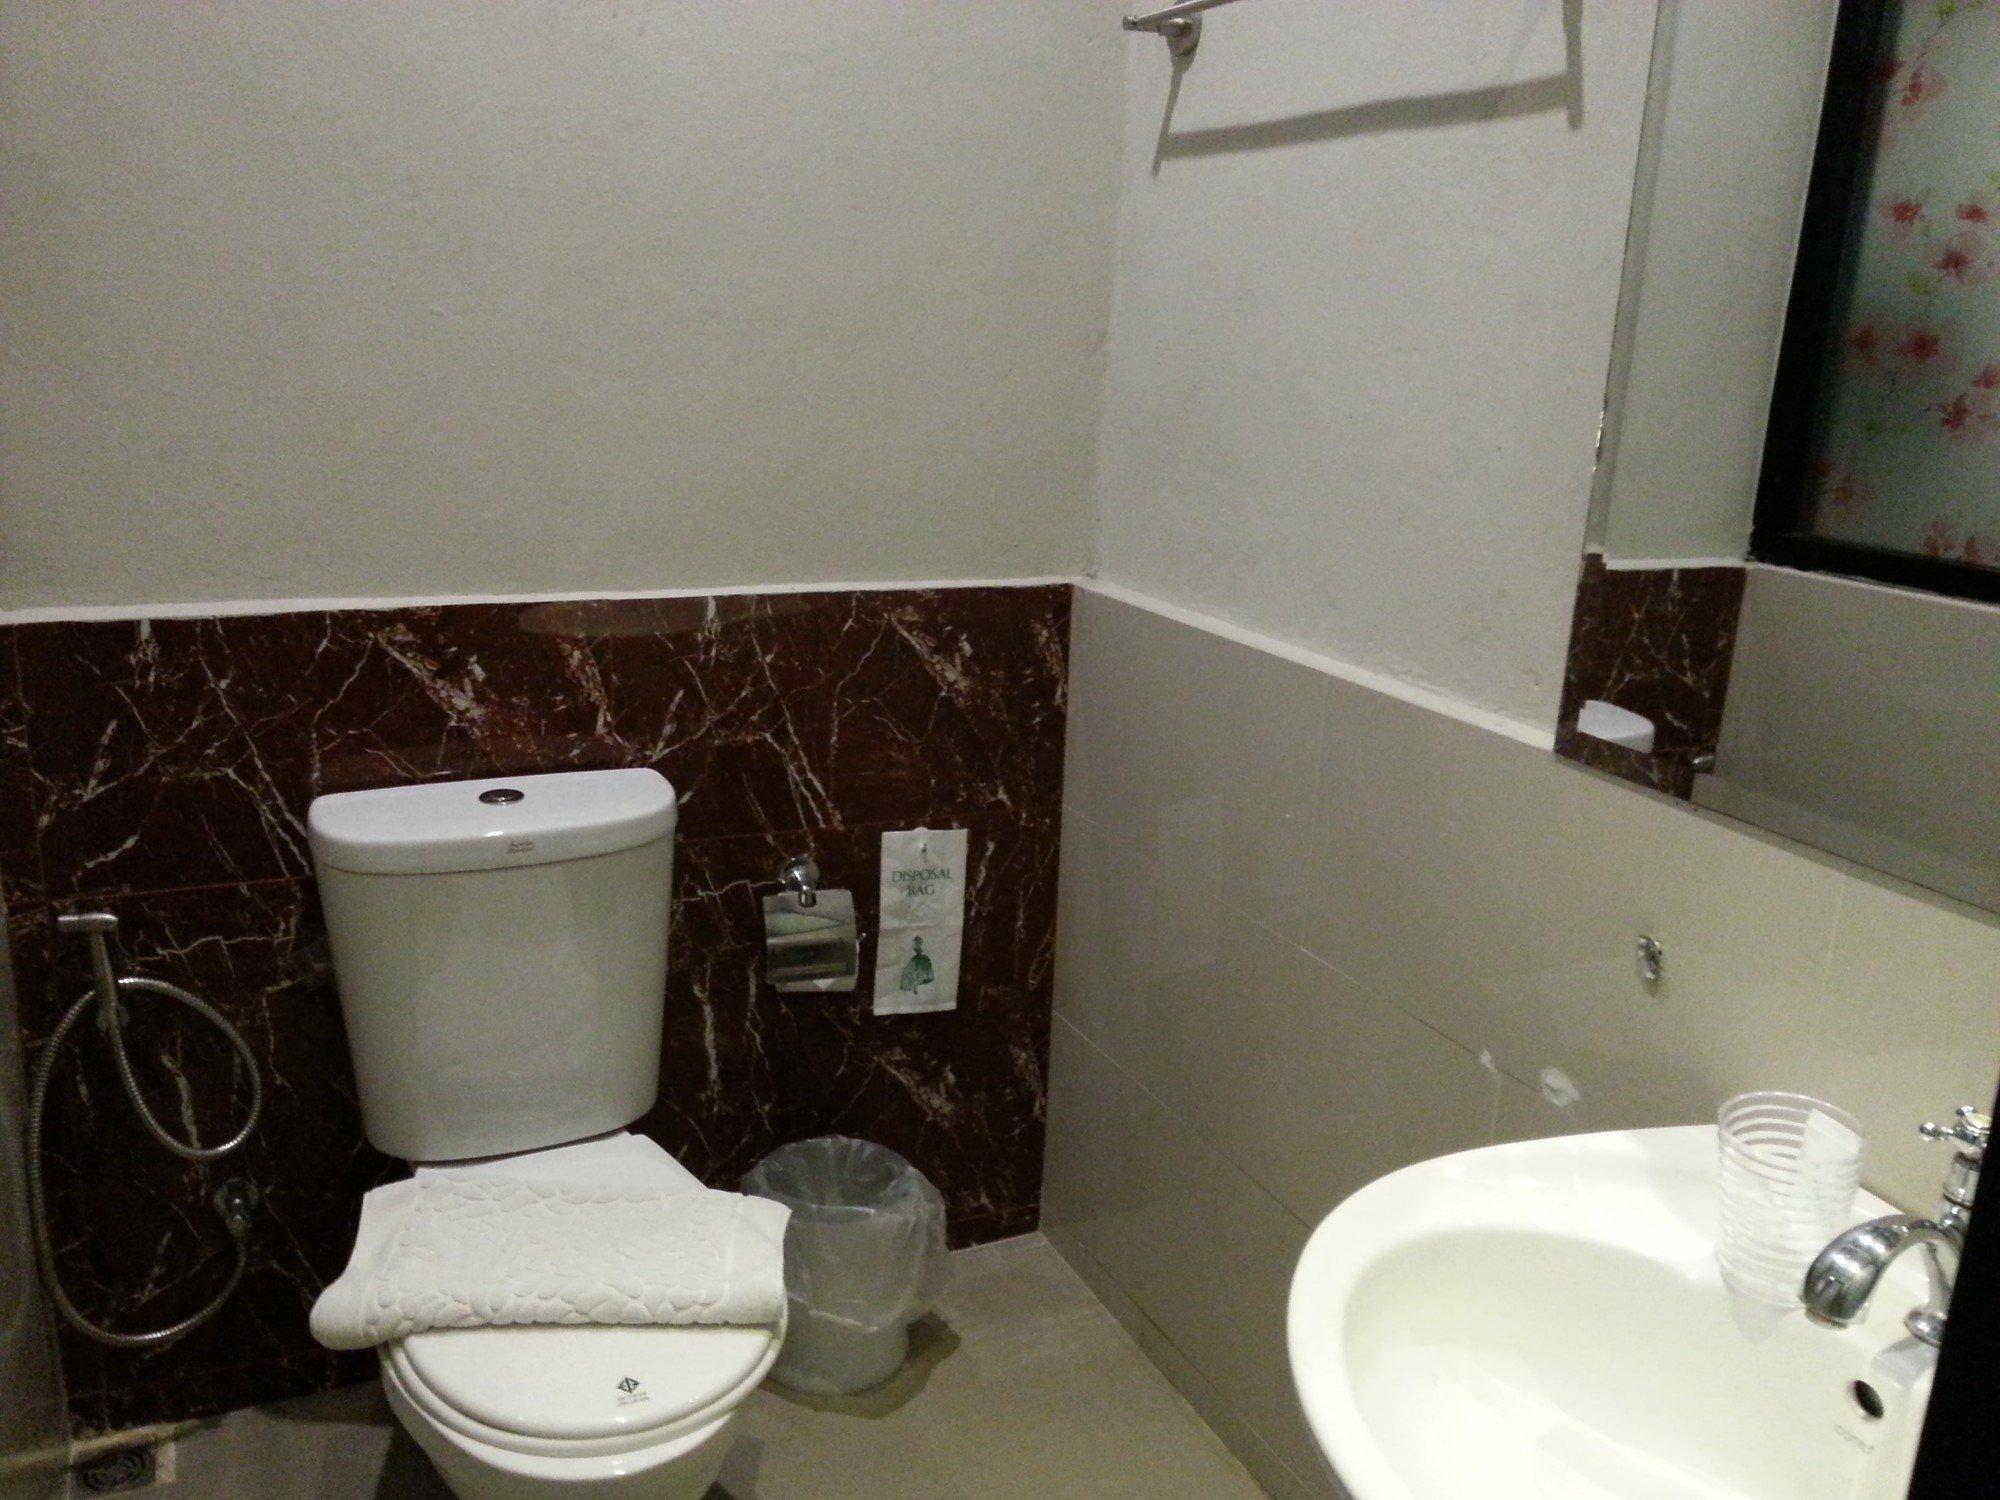 Bathroom at the V Hotel Vajira